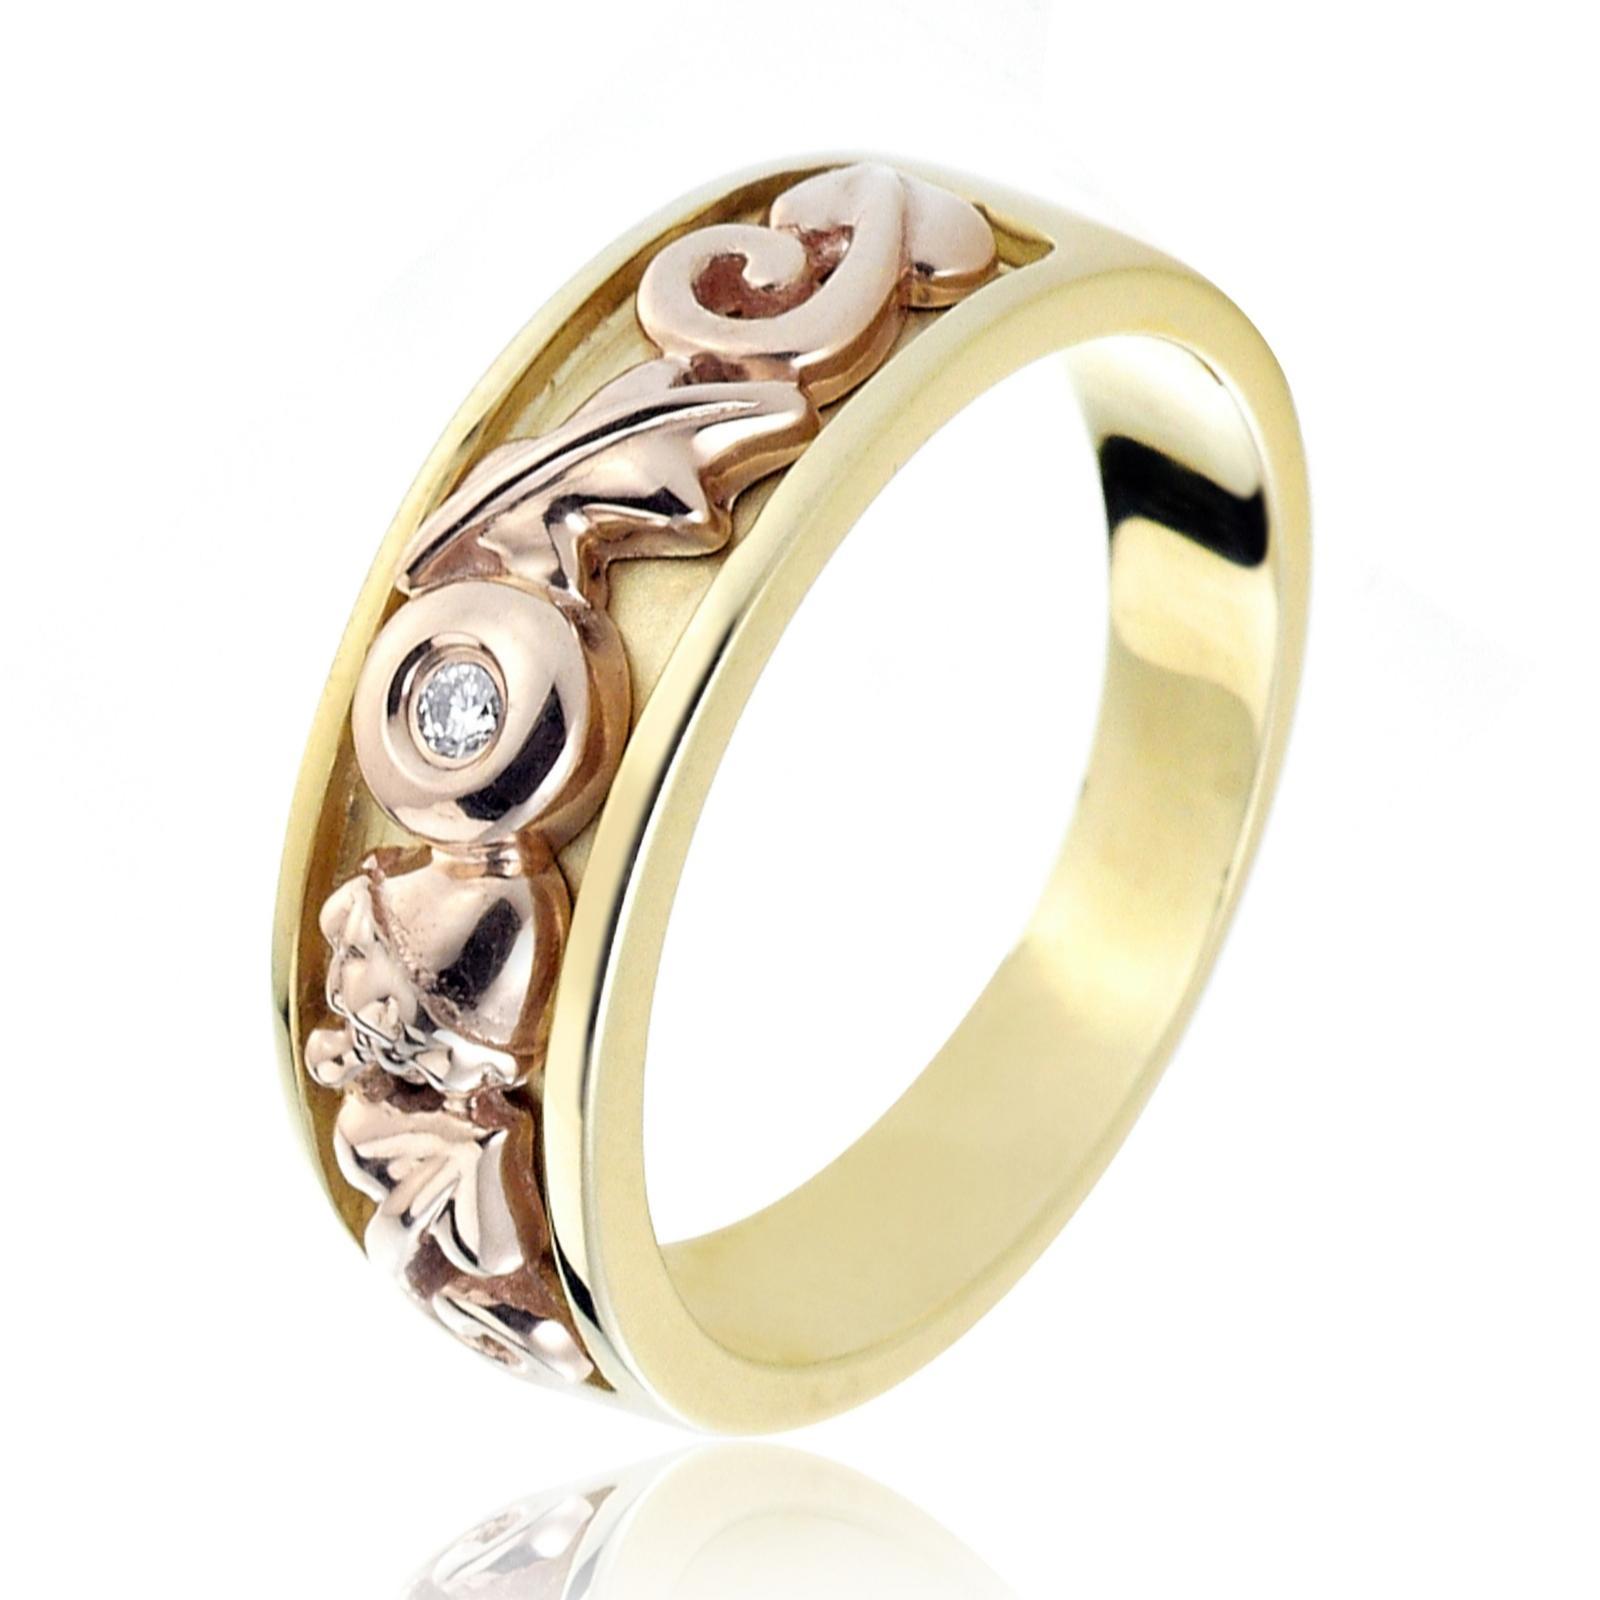 frumpy to funky Clogau Gold on QVC create Royal Celebration Ring